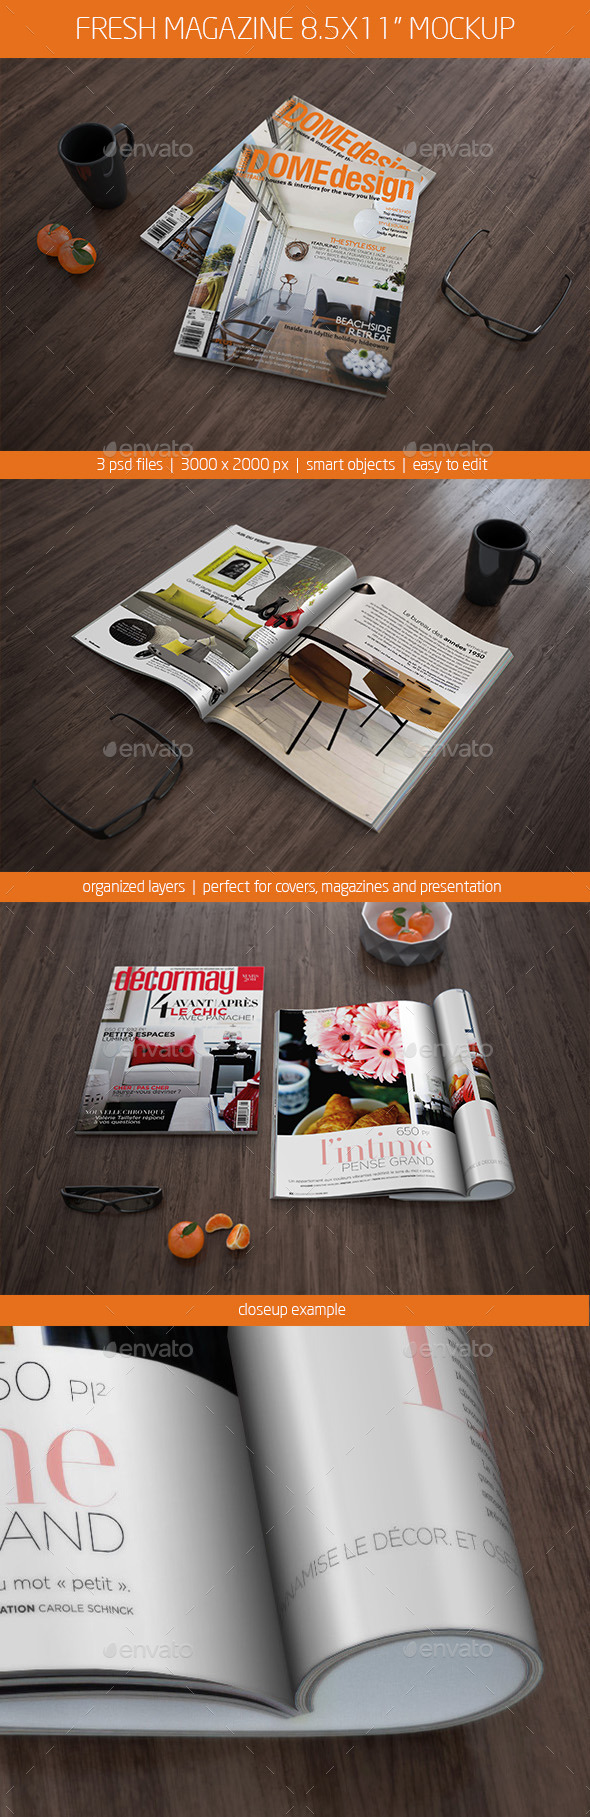 "Fresh Magazine Mockup 8.5x11"" - Magazines Print"